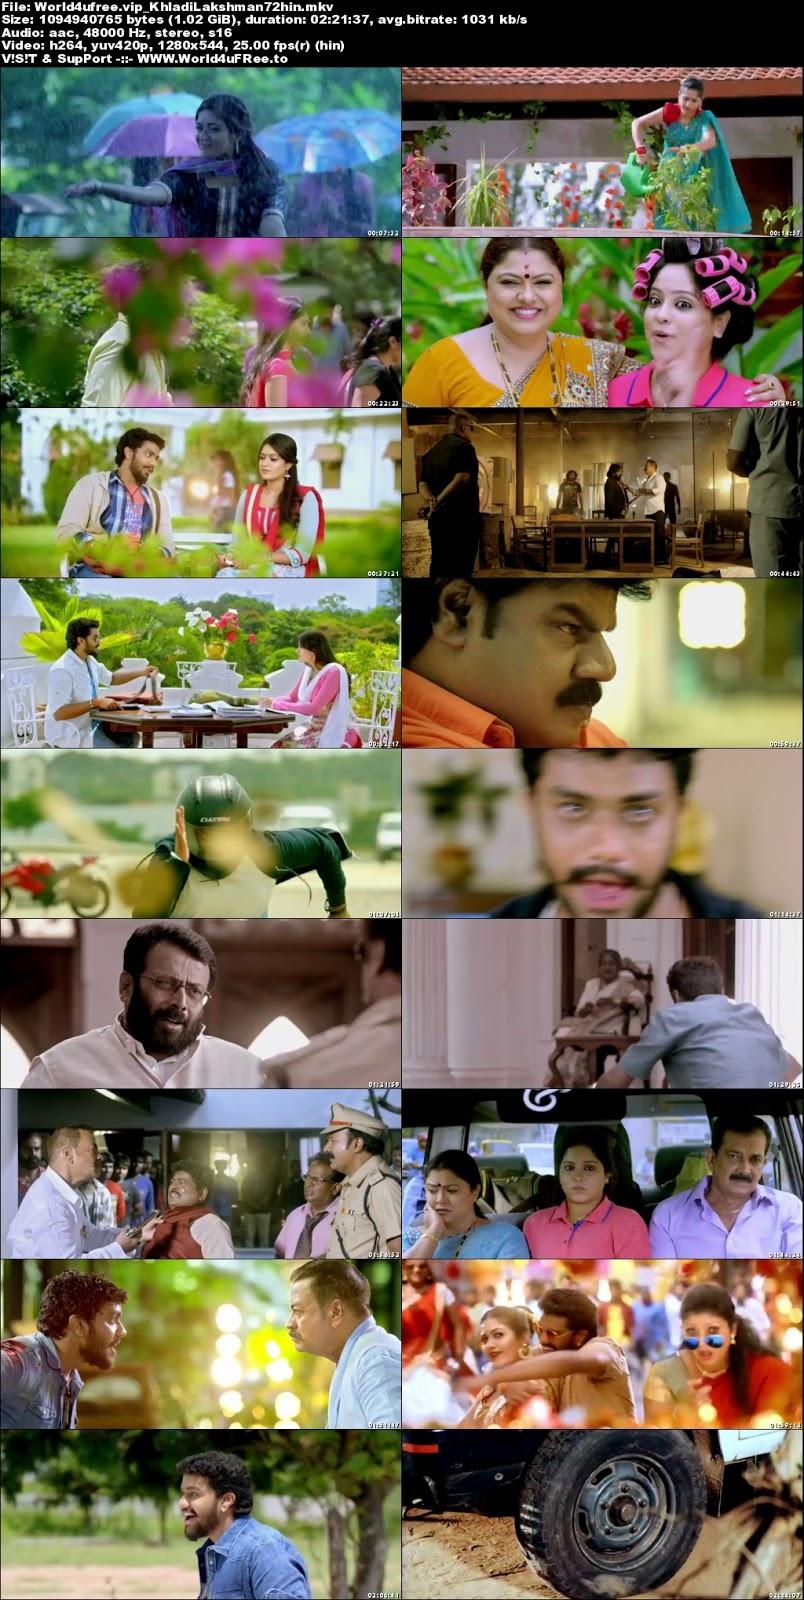 Khiladi Lakshmana 2018 Hindi Dubbed 720p WEBRip 1Gb x264 world4ufree.vip , South indian movie Khiladi Lakshmana 2018 hindi dubbed world4ufree.vip 720p hdrip webrip dvdrip 700mb brrip bluray free download or watch online at world4ufree.vip